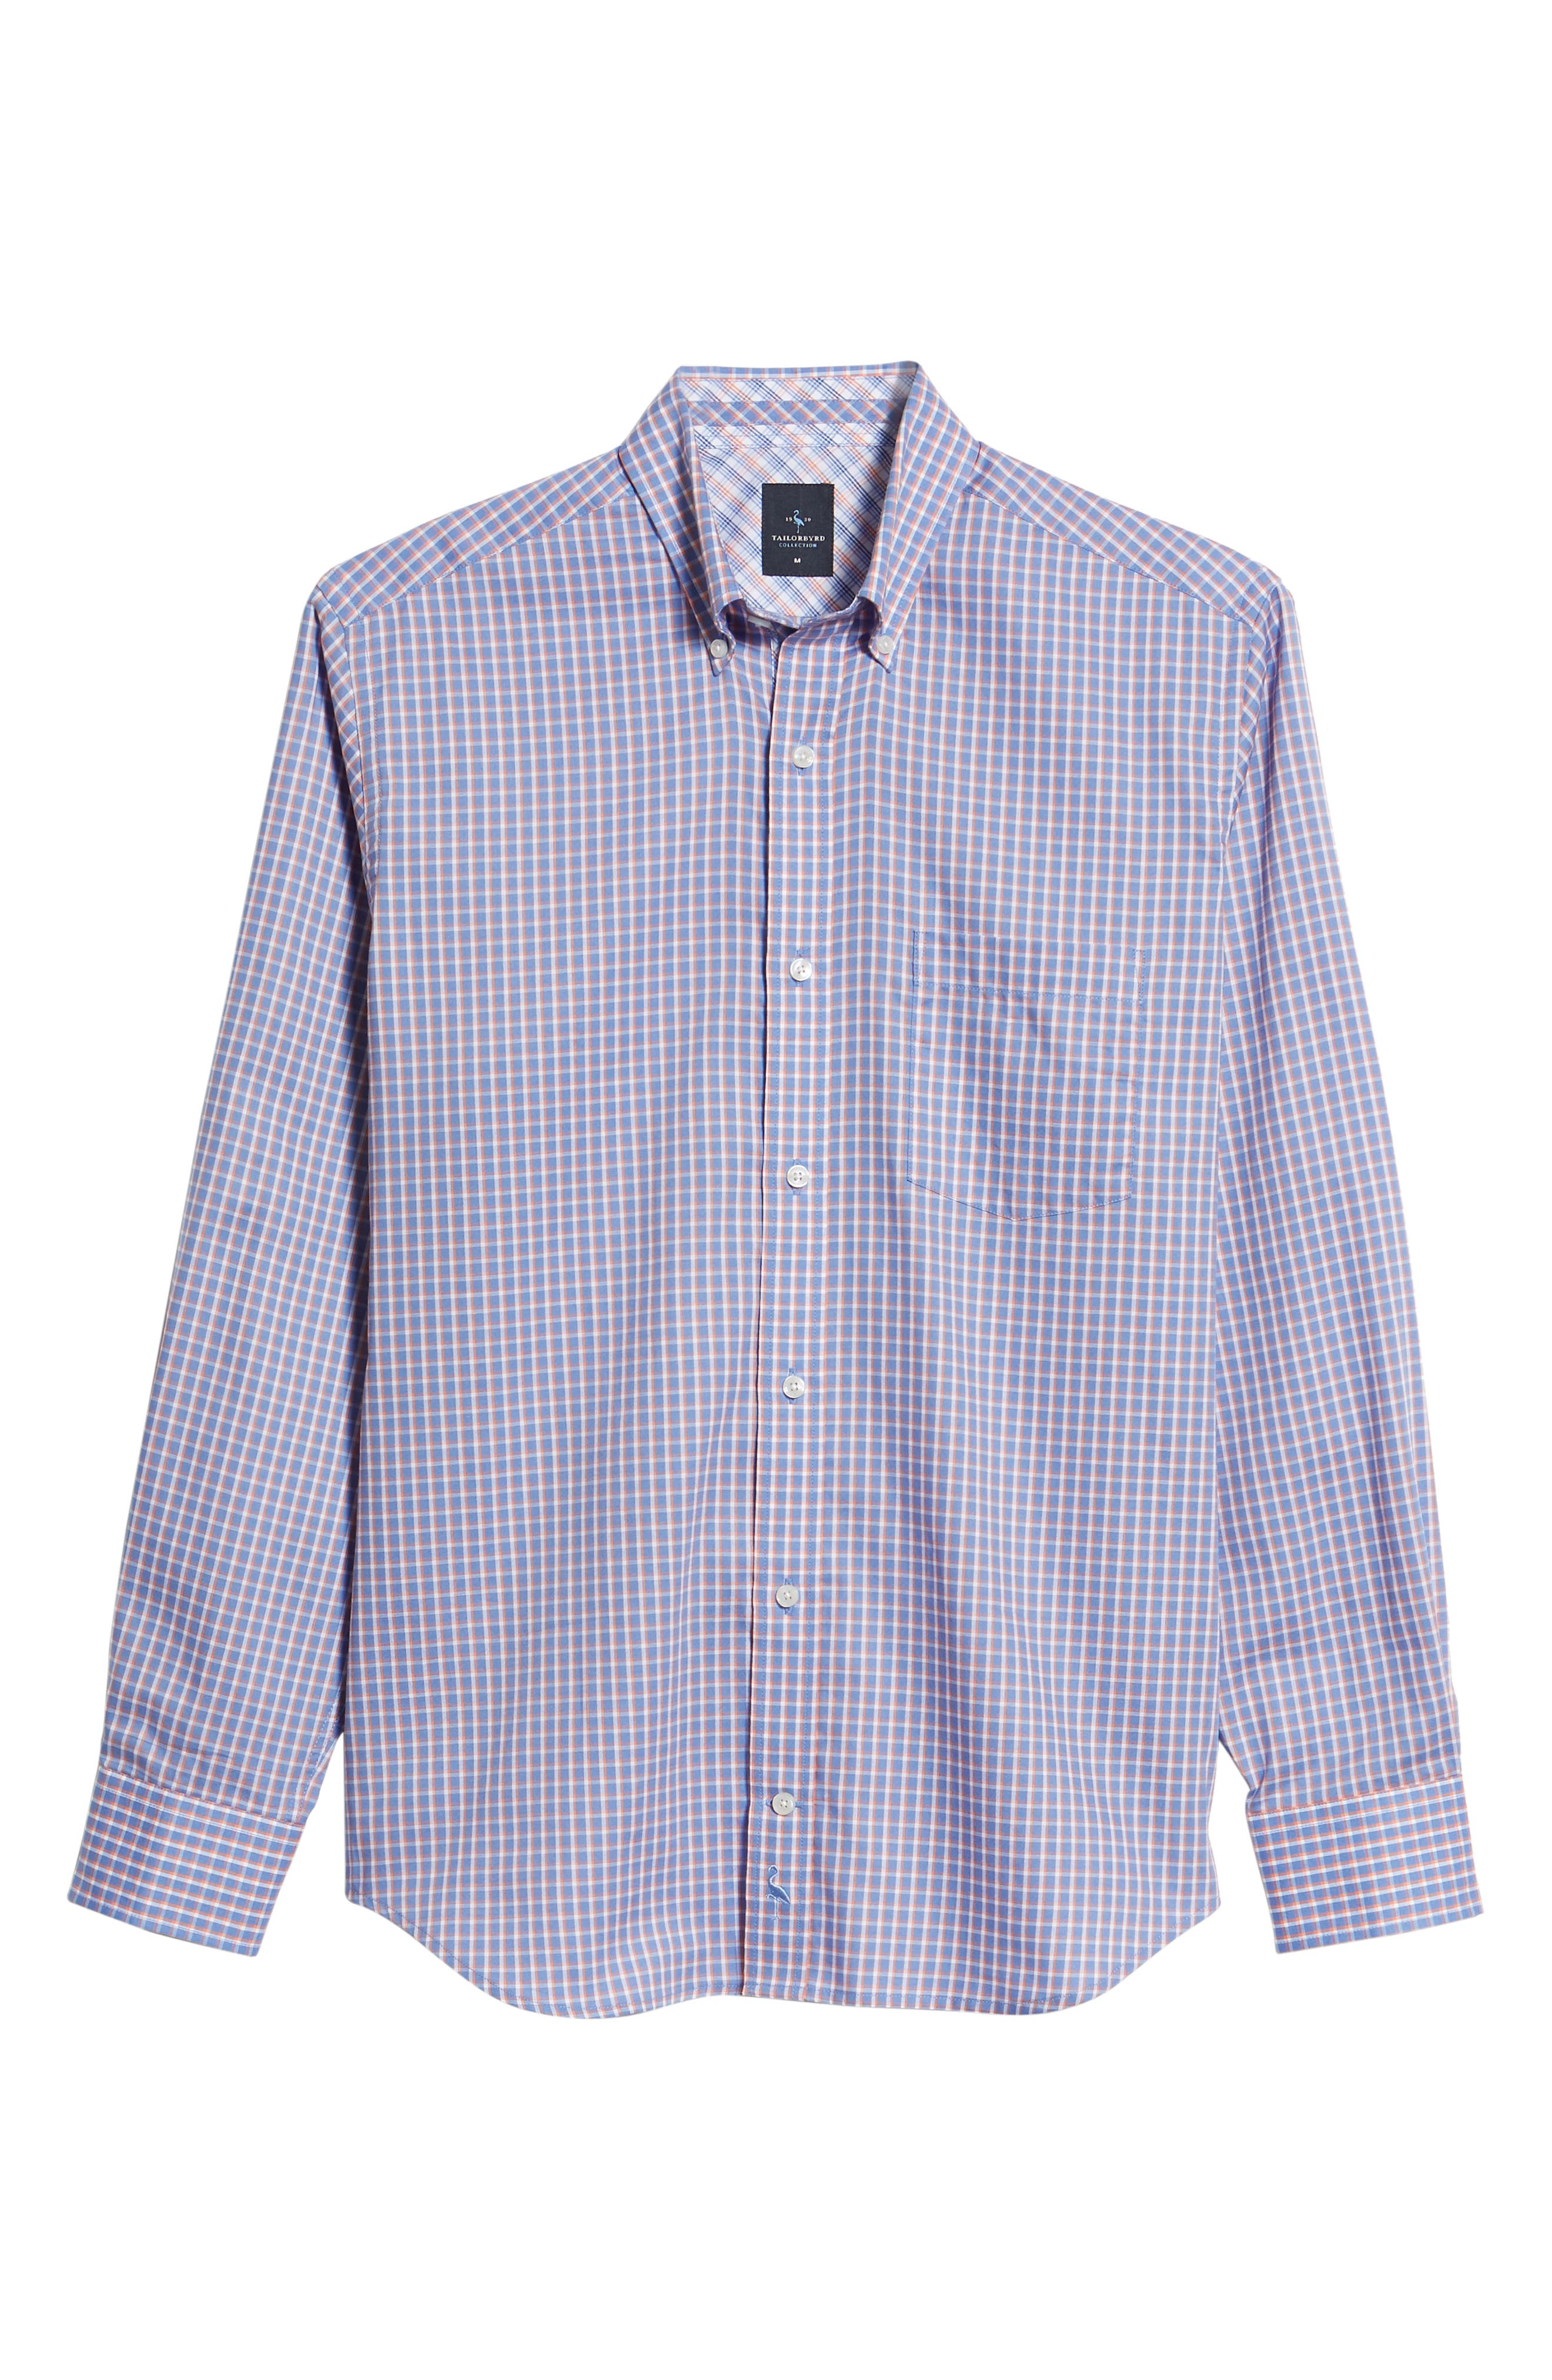 Bader Regular Fit Check Sport Shirt,                             Alternate thumbnail 6, color,                             Navy